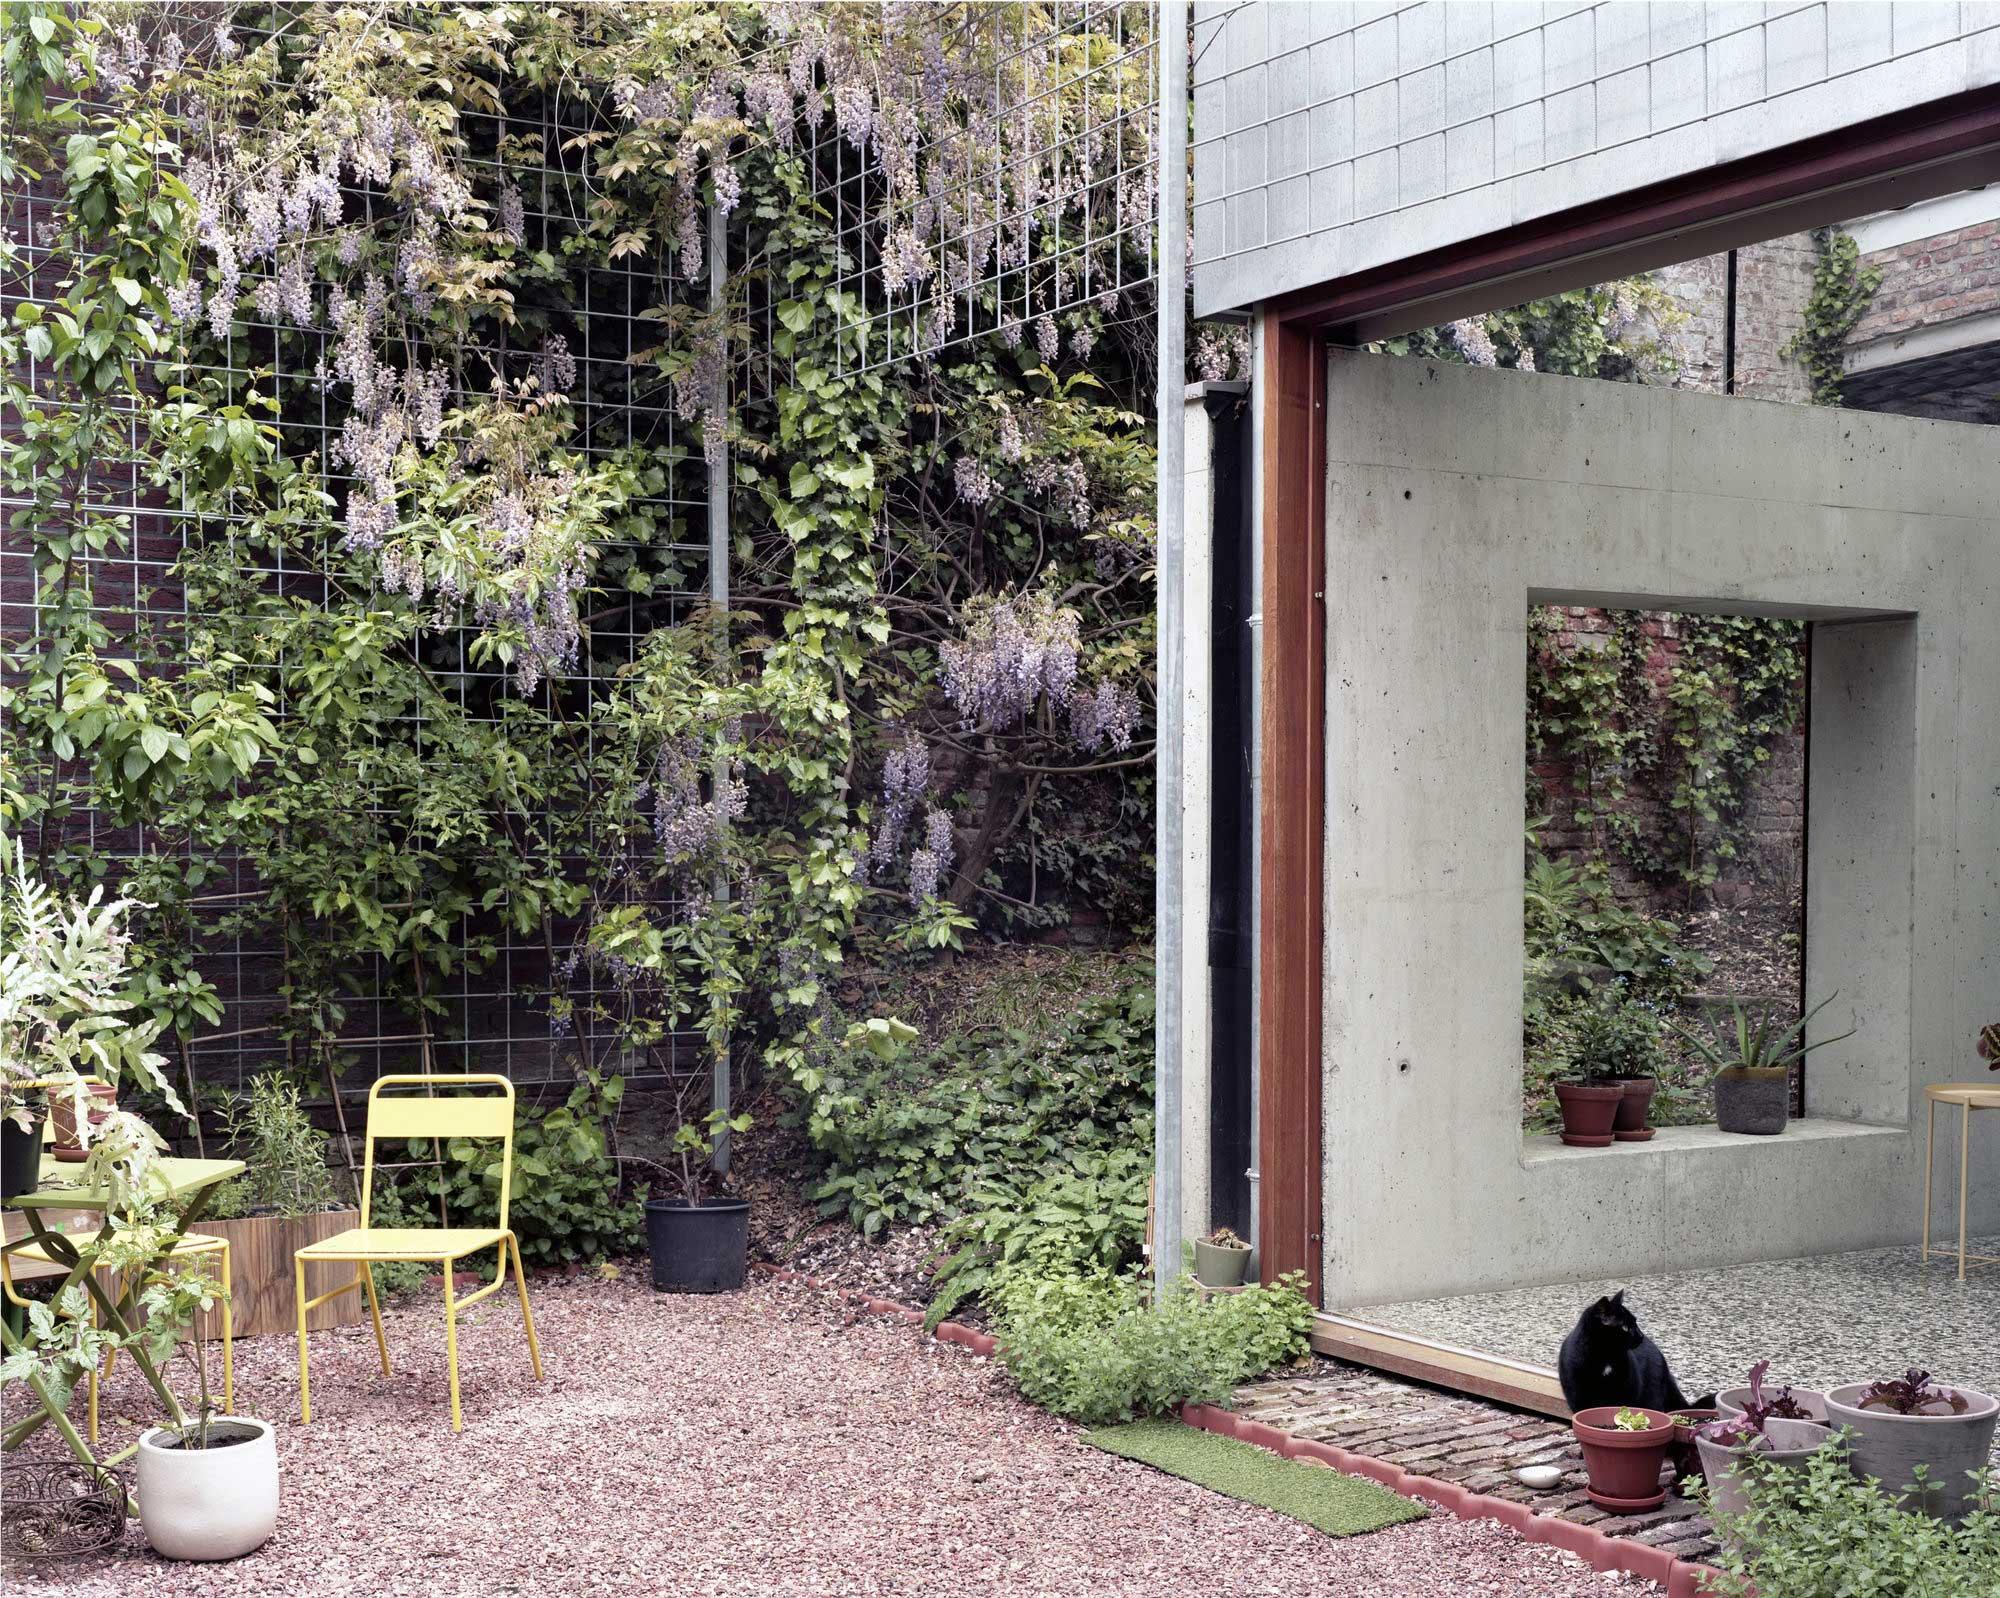 51n4e, Room In The City, Leuven, Belgium Architecture, Biophilic Design, Photo Maxime Delvaux | Yellowtrace